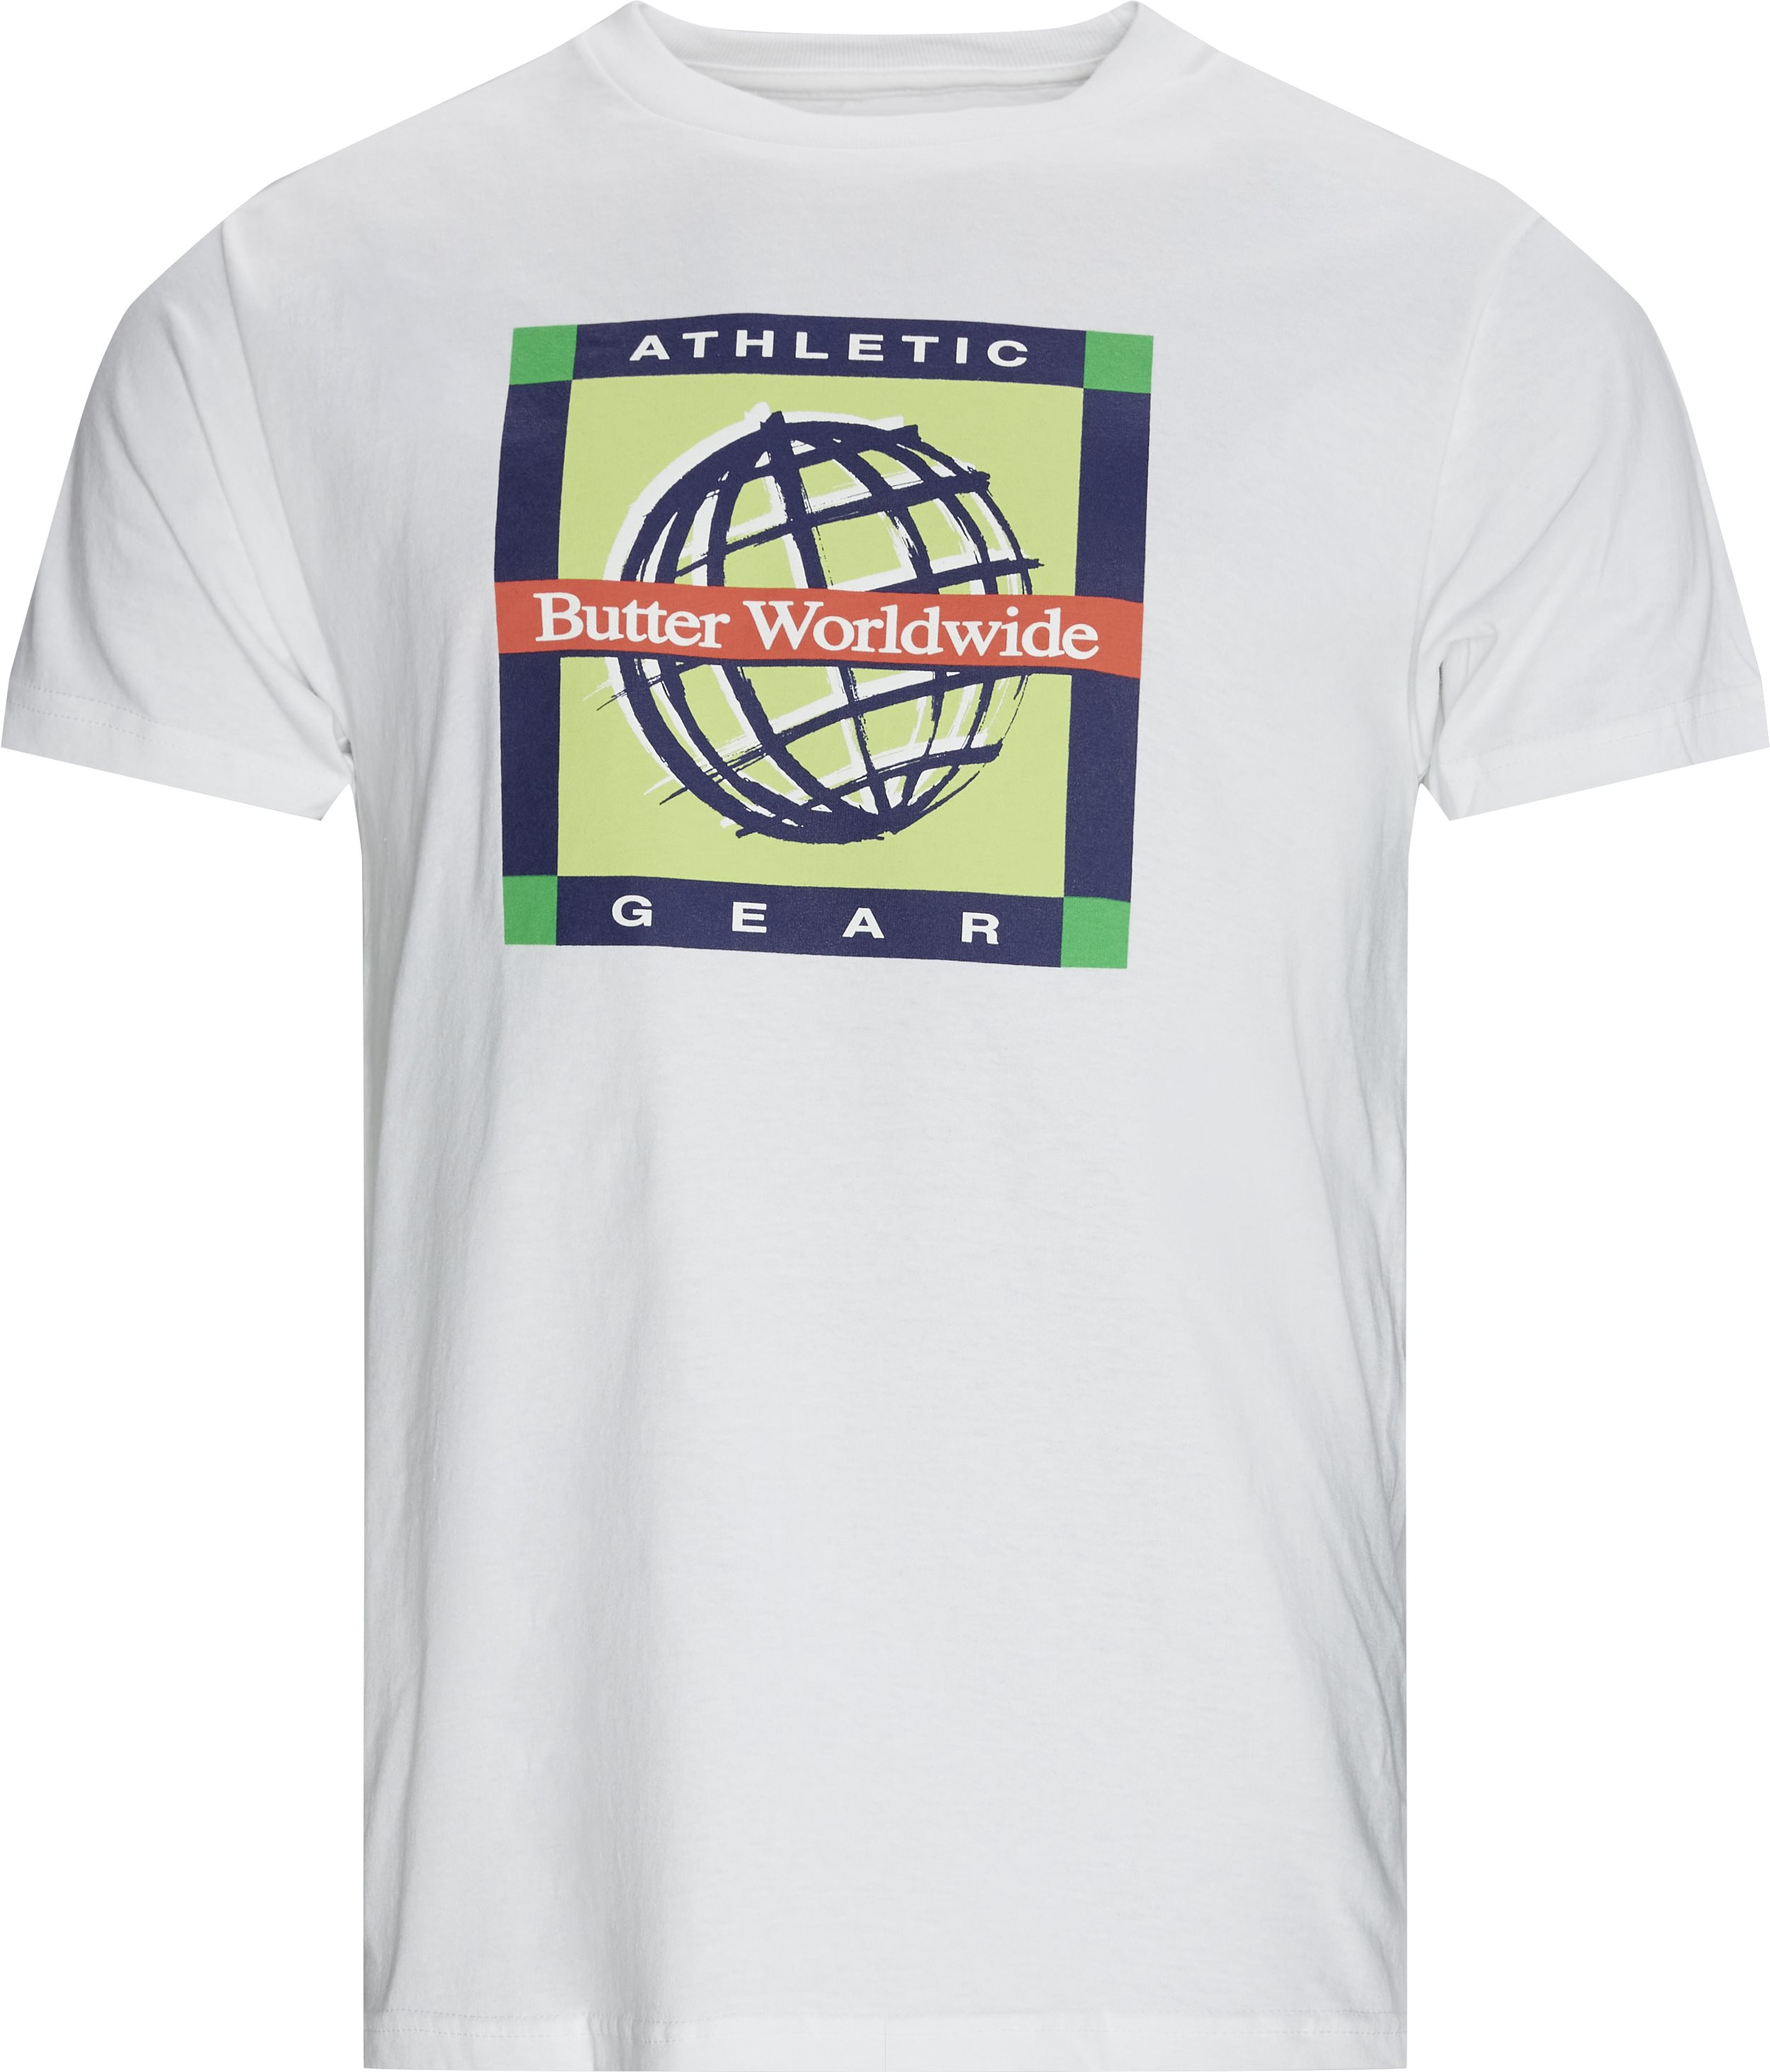 Athletic Gear Tee - T-shirts - Regular - Hvid